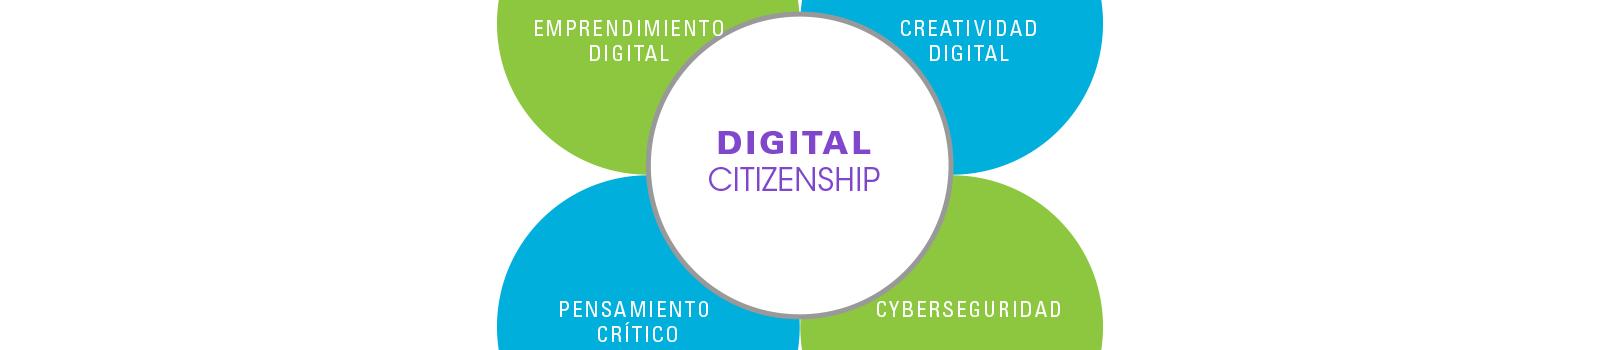 digitalcitizenship_